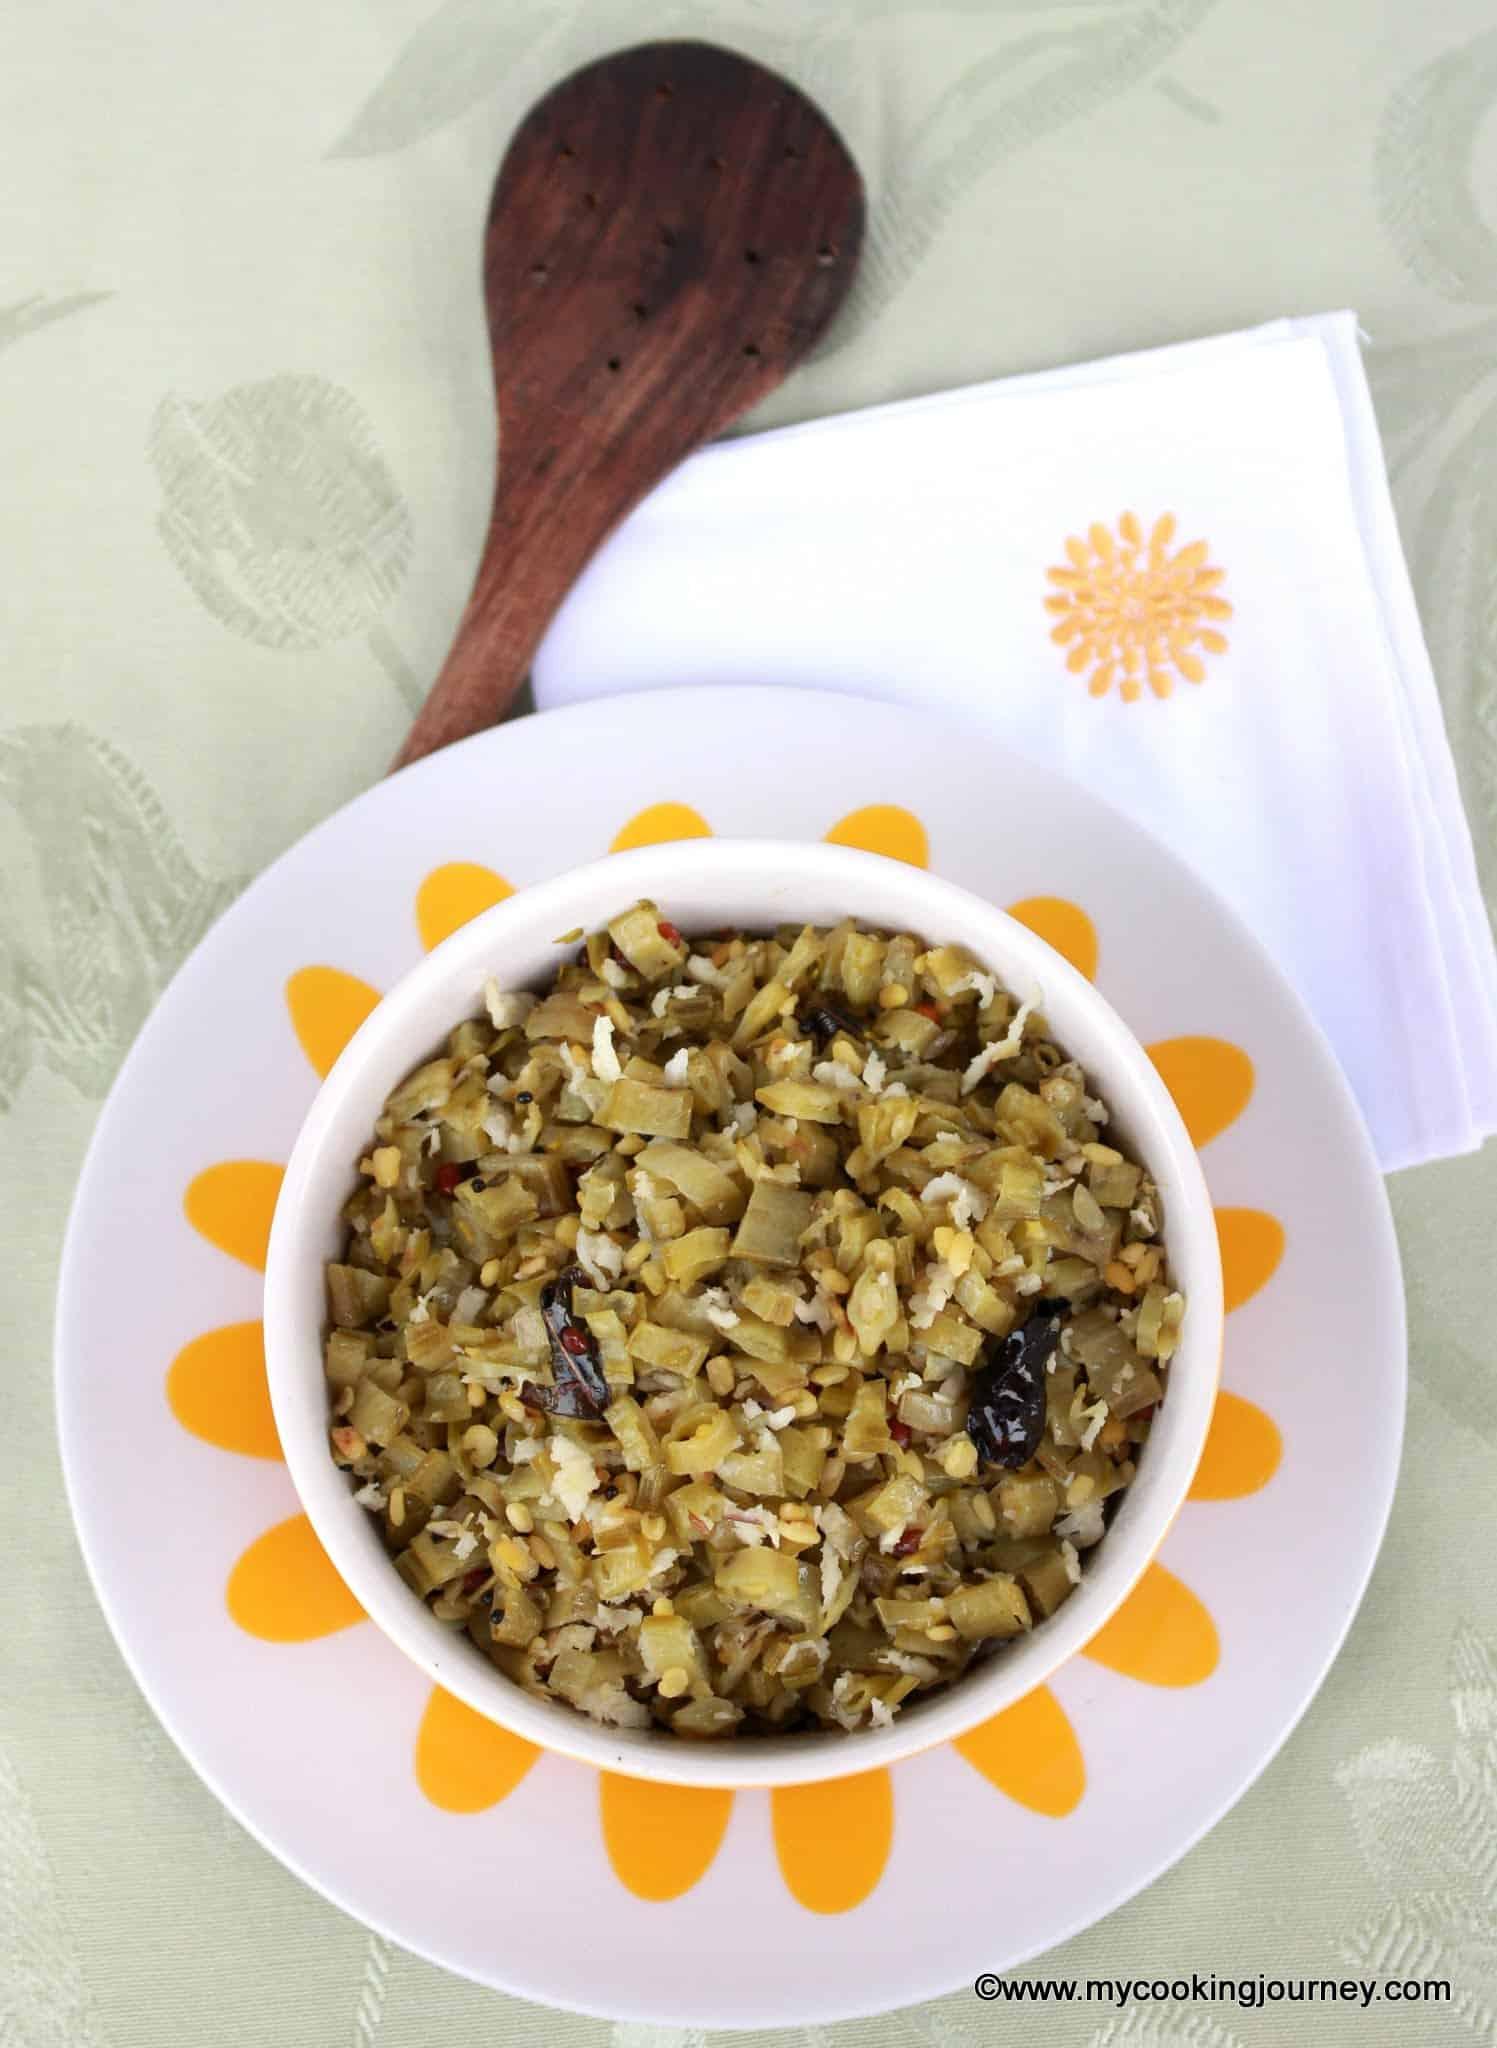 Kothavarangai Poriyal – Kothavarangai Curry with Coconut – Cluster Beans Stir-Fry with Coconut